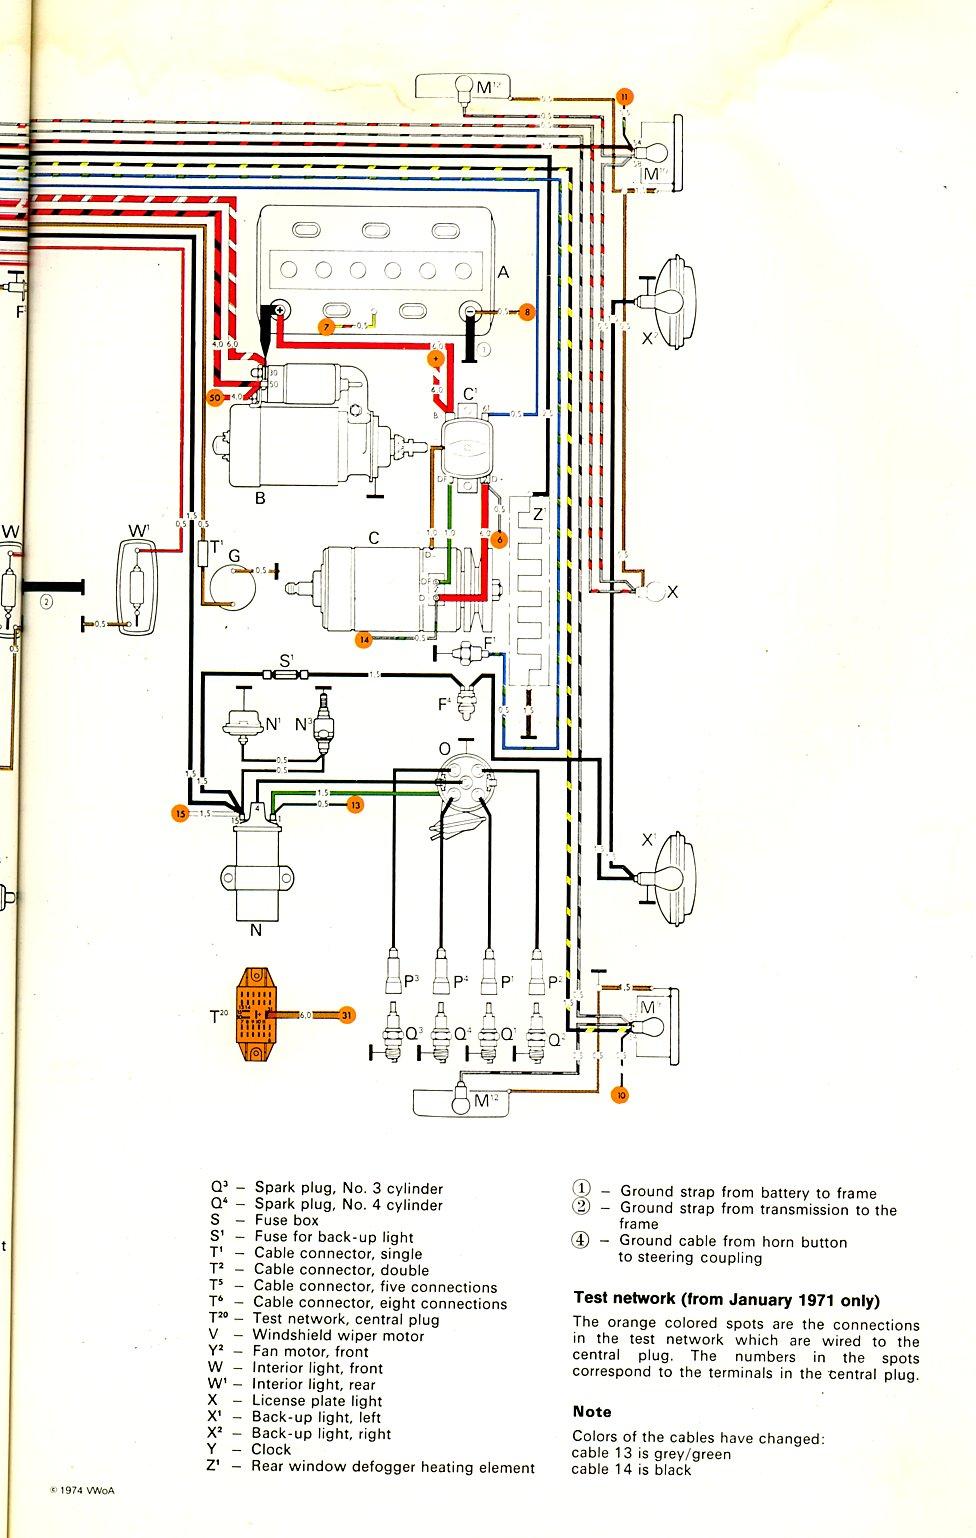 1983 Ford Headlight Wiring Diagram 1971 Bus Wiring Diagram Thegoldenbug Com